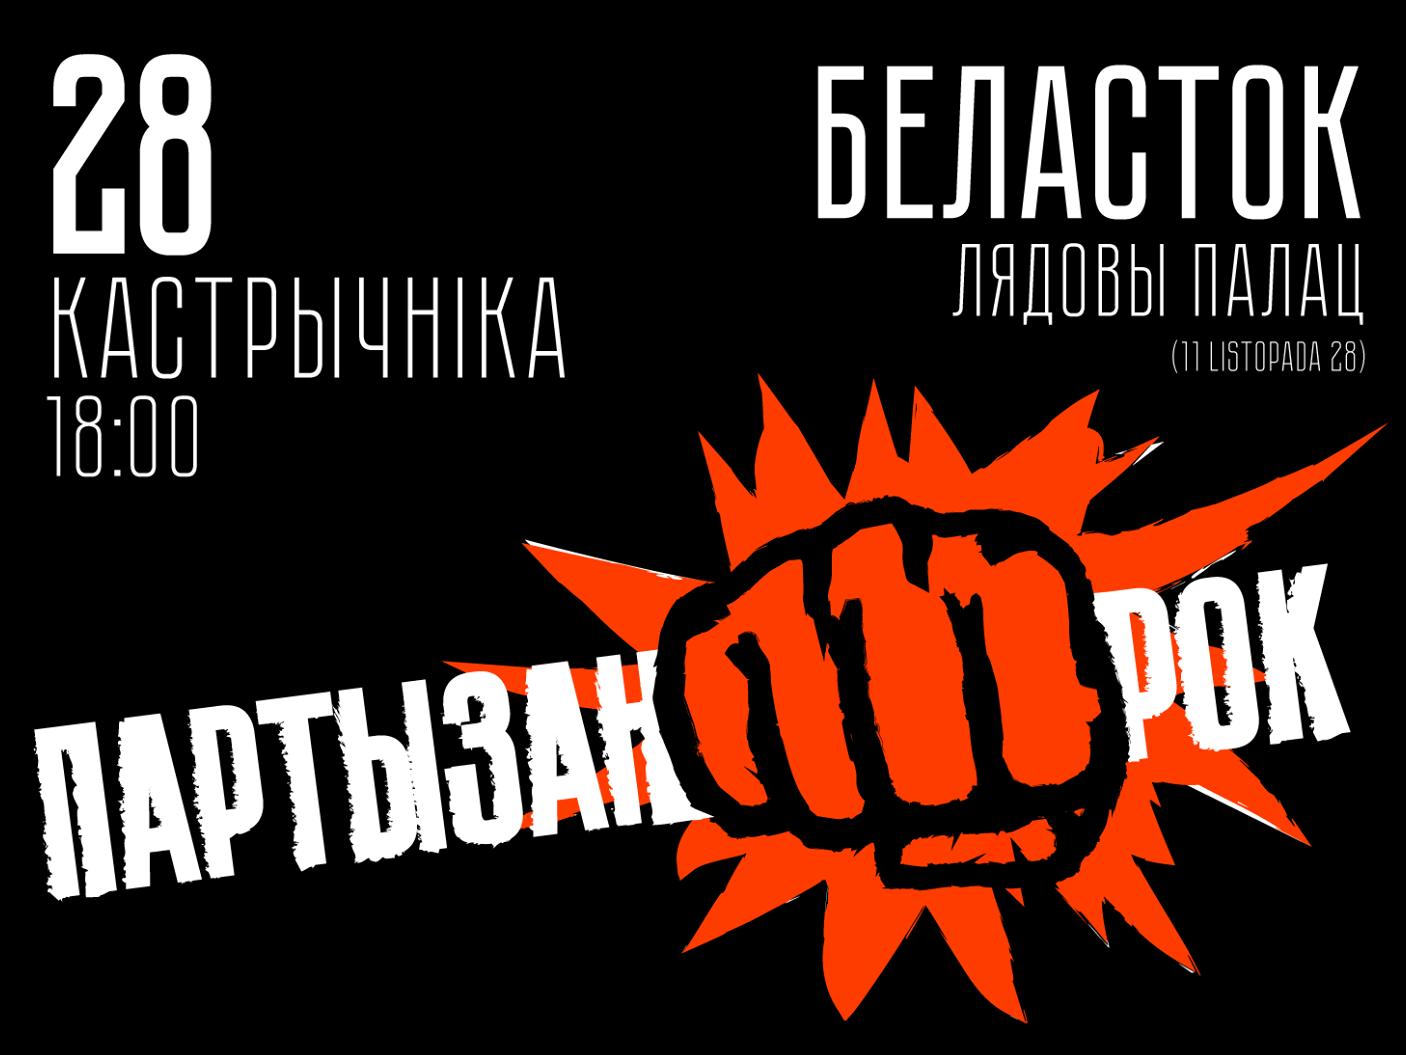 Партизан Рок